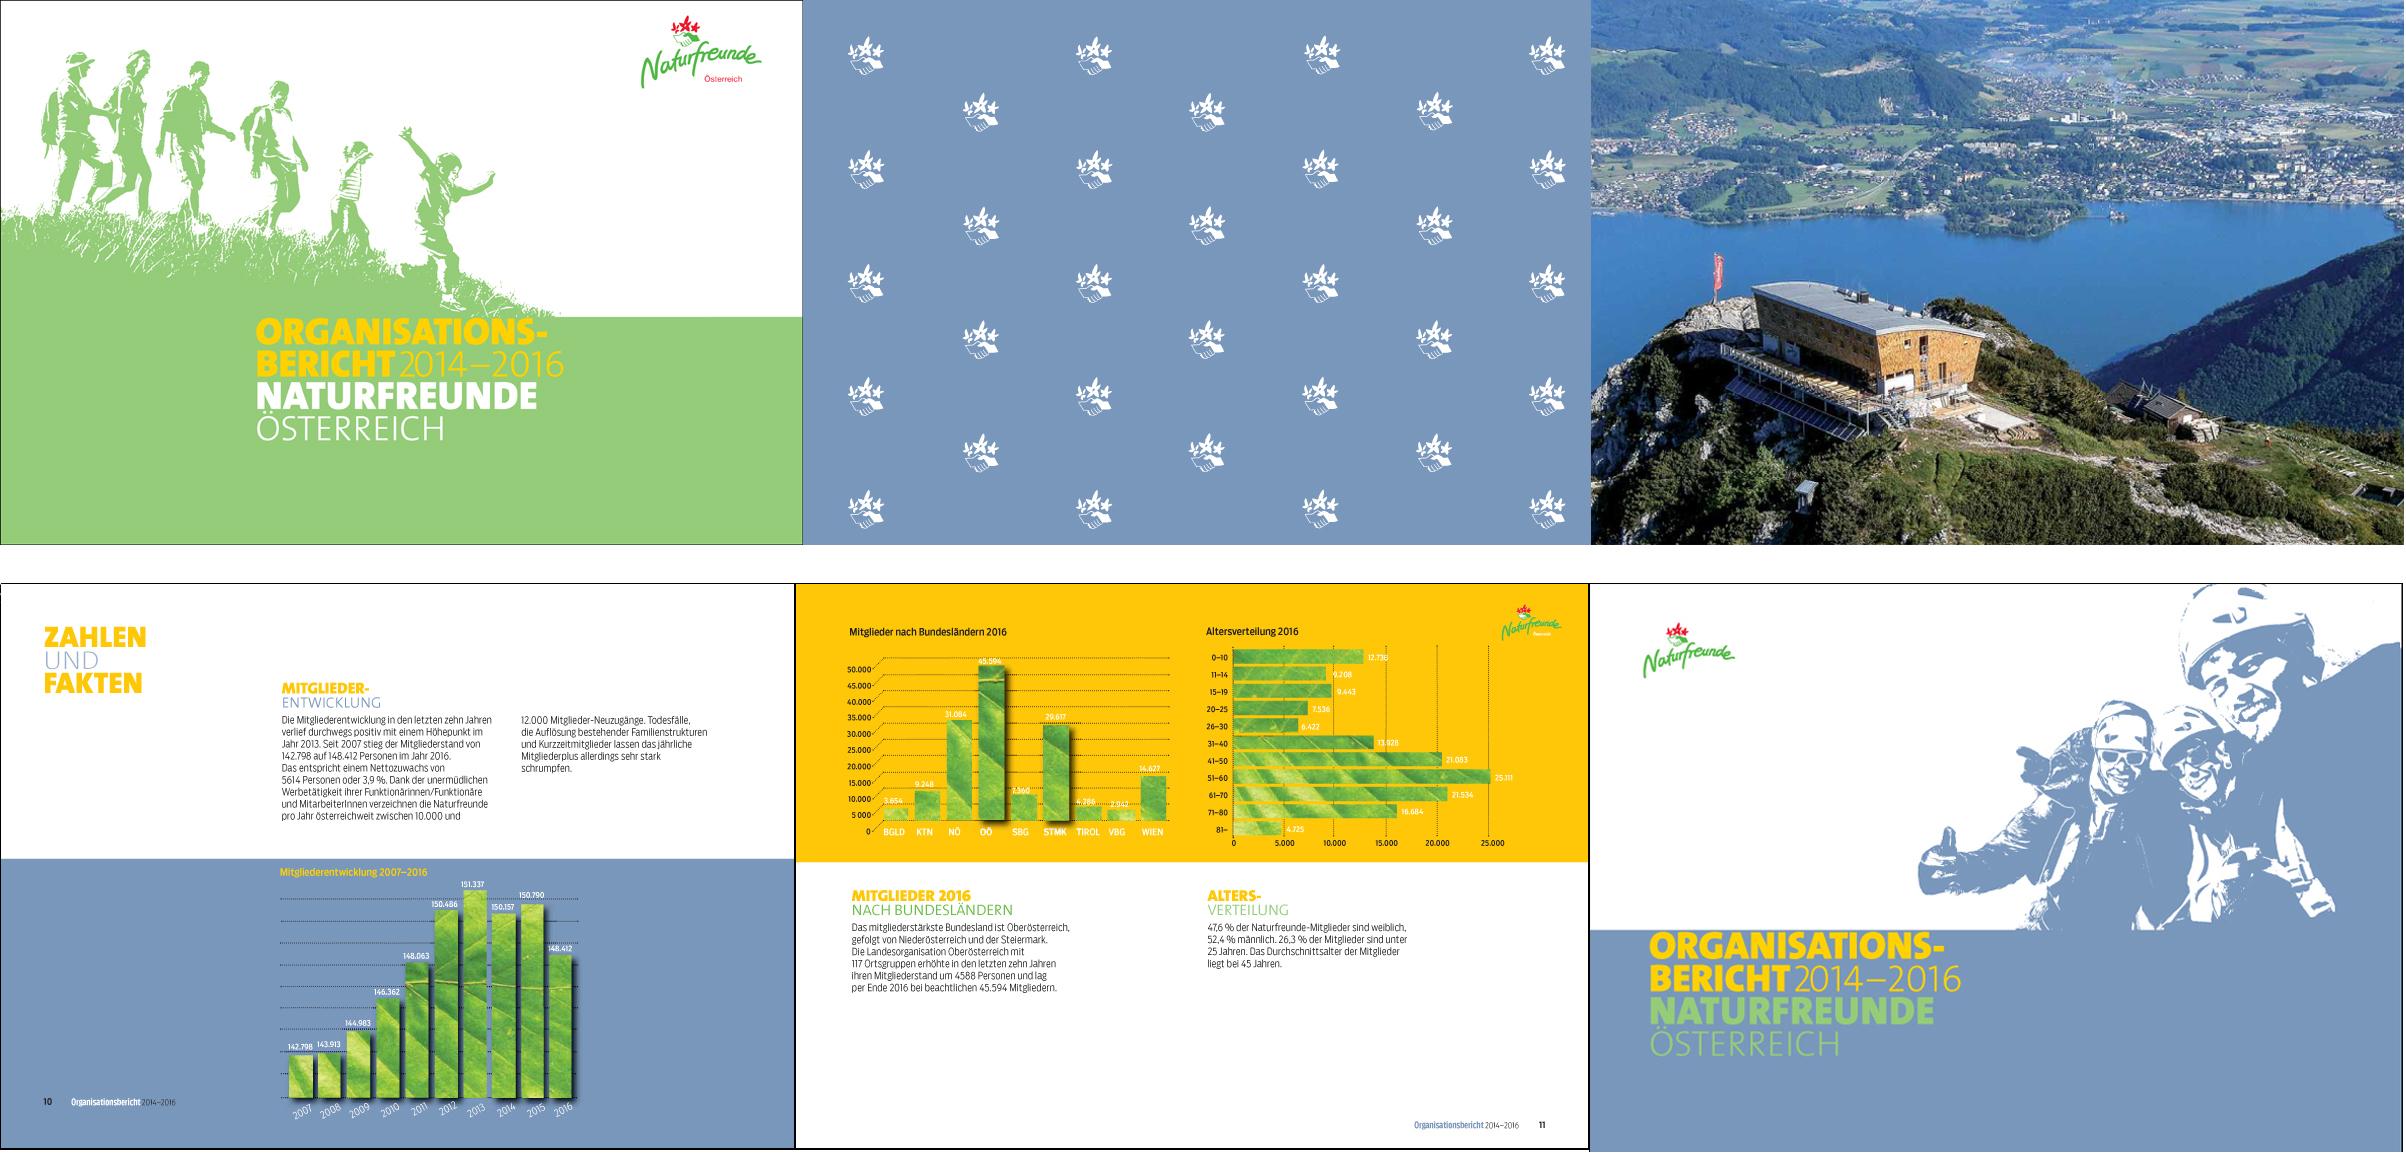 Three-Years-Report for Naturfreunde, Austrian Leisure Organisation